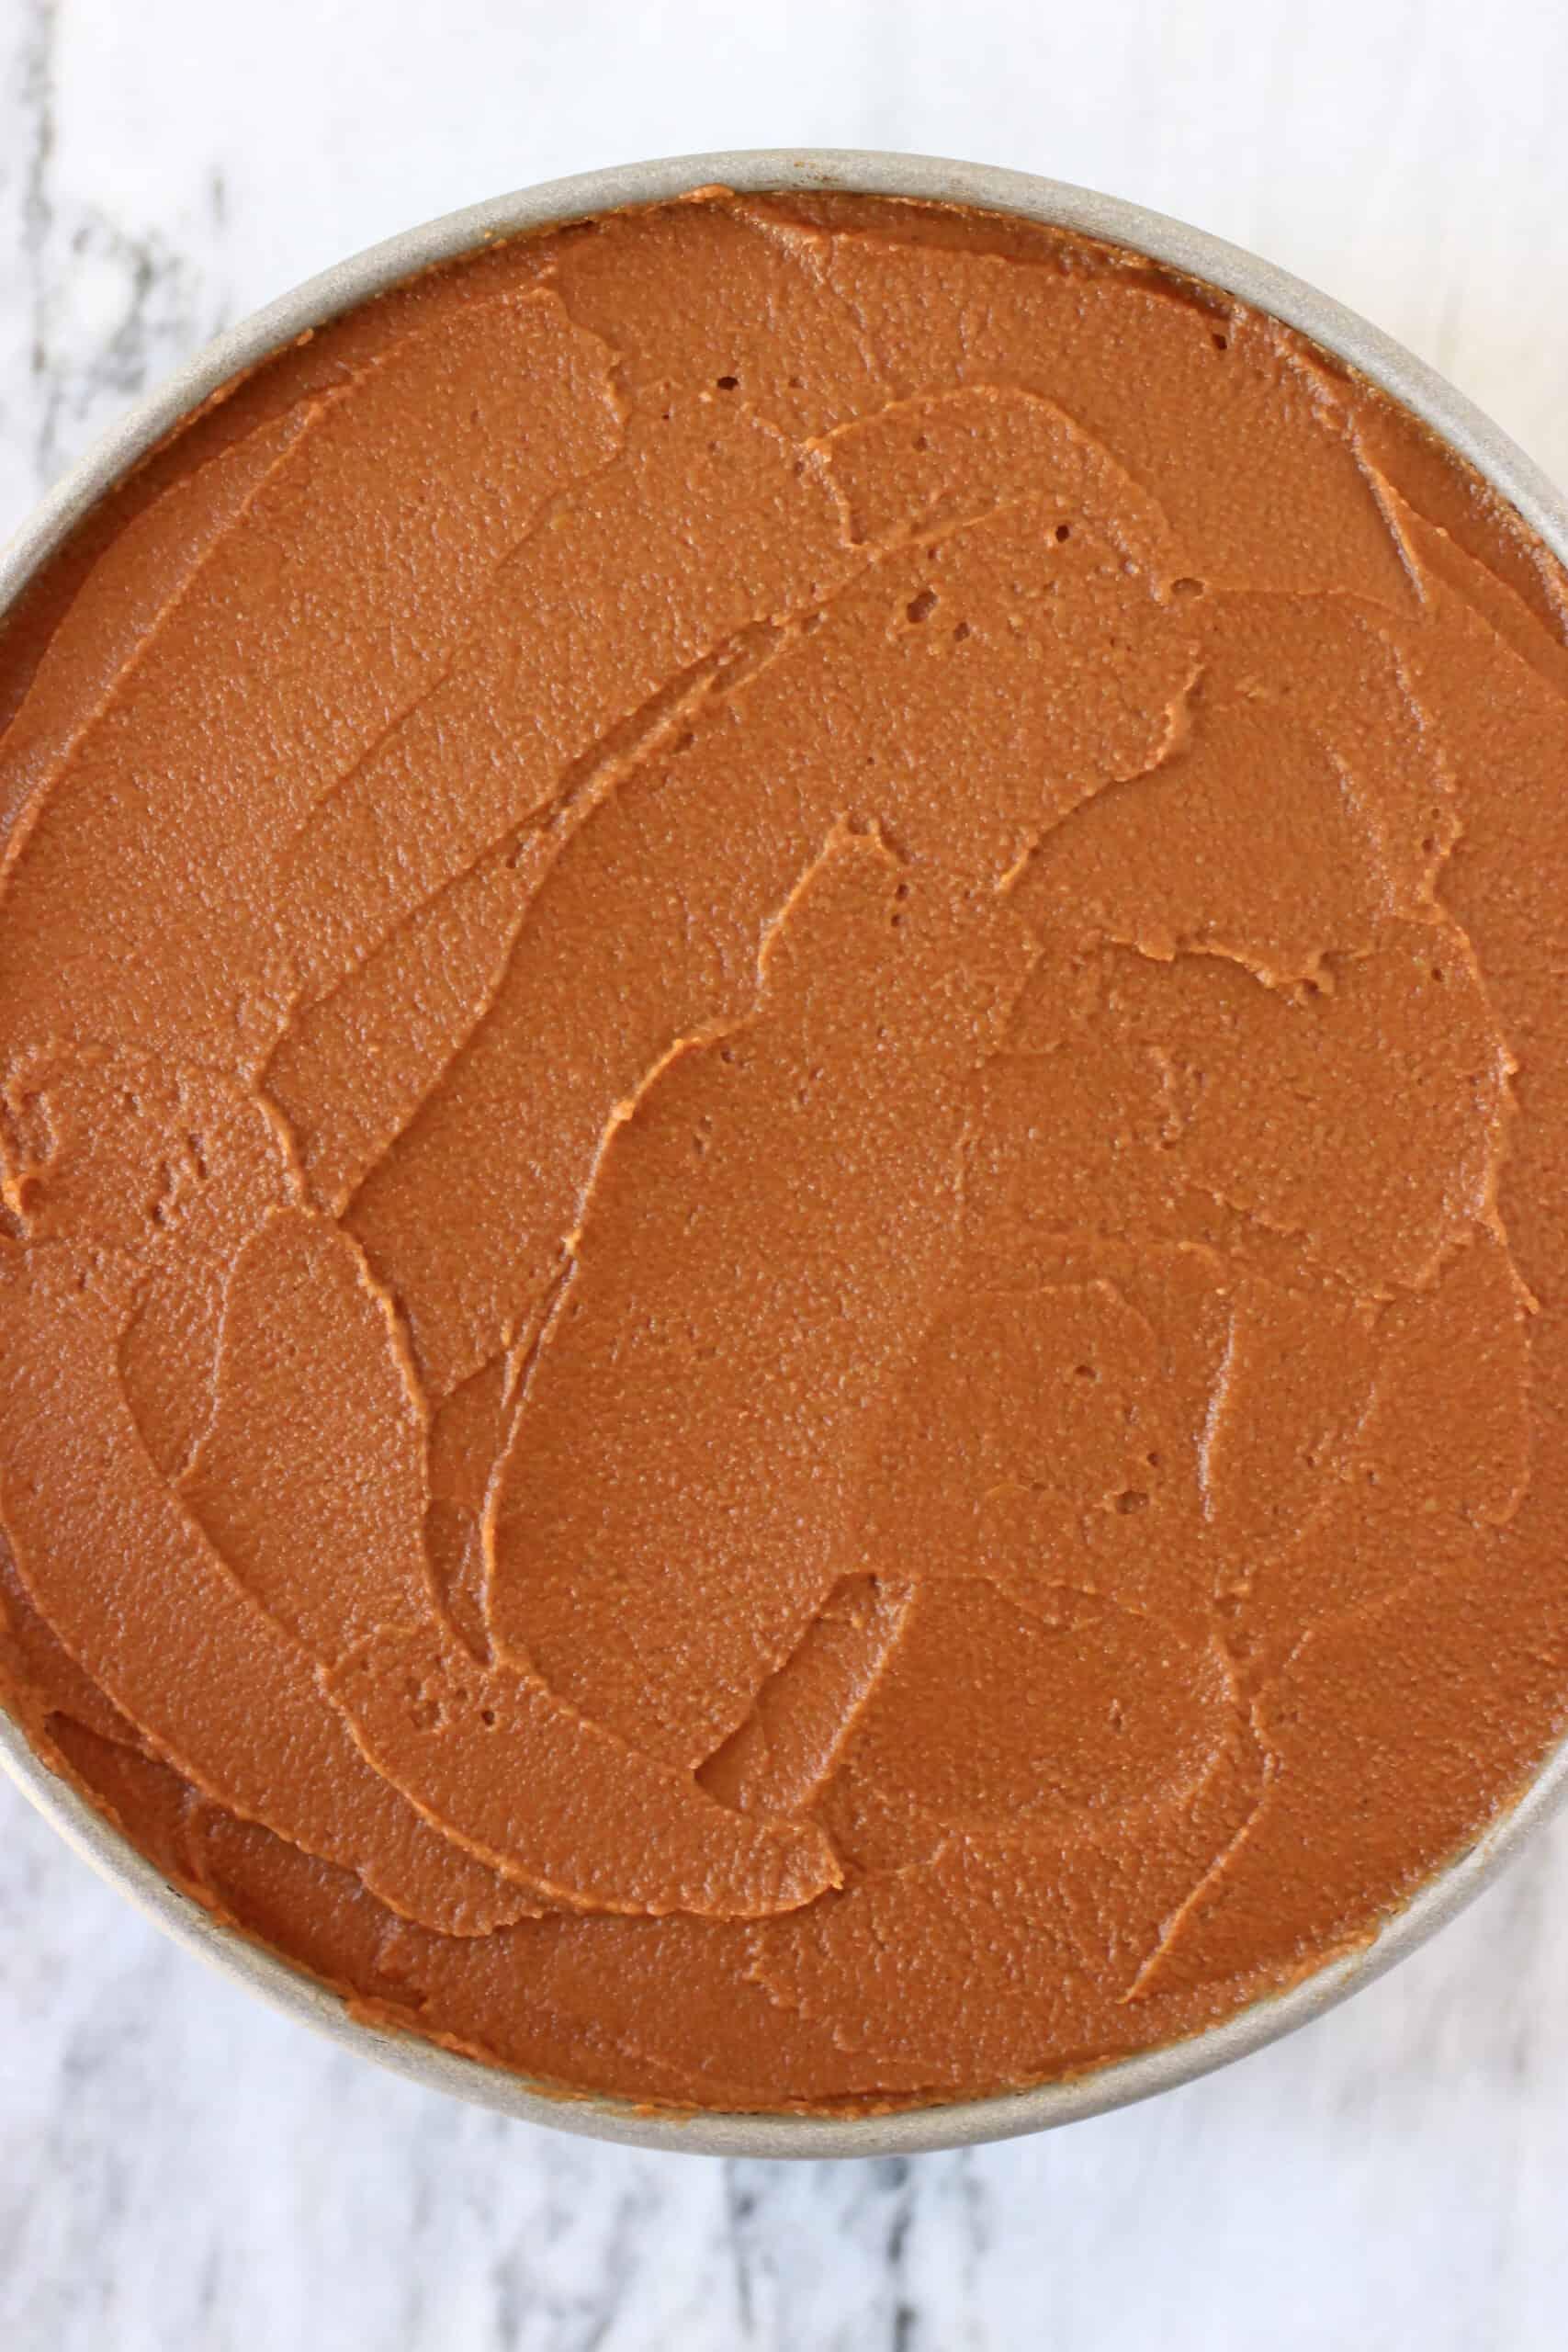 Vegan chocolate mousse on vegan chocolate sponge in a springform baking tin